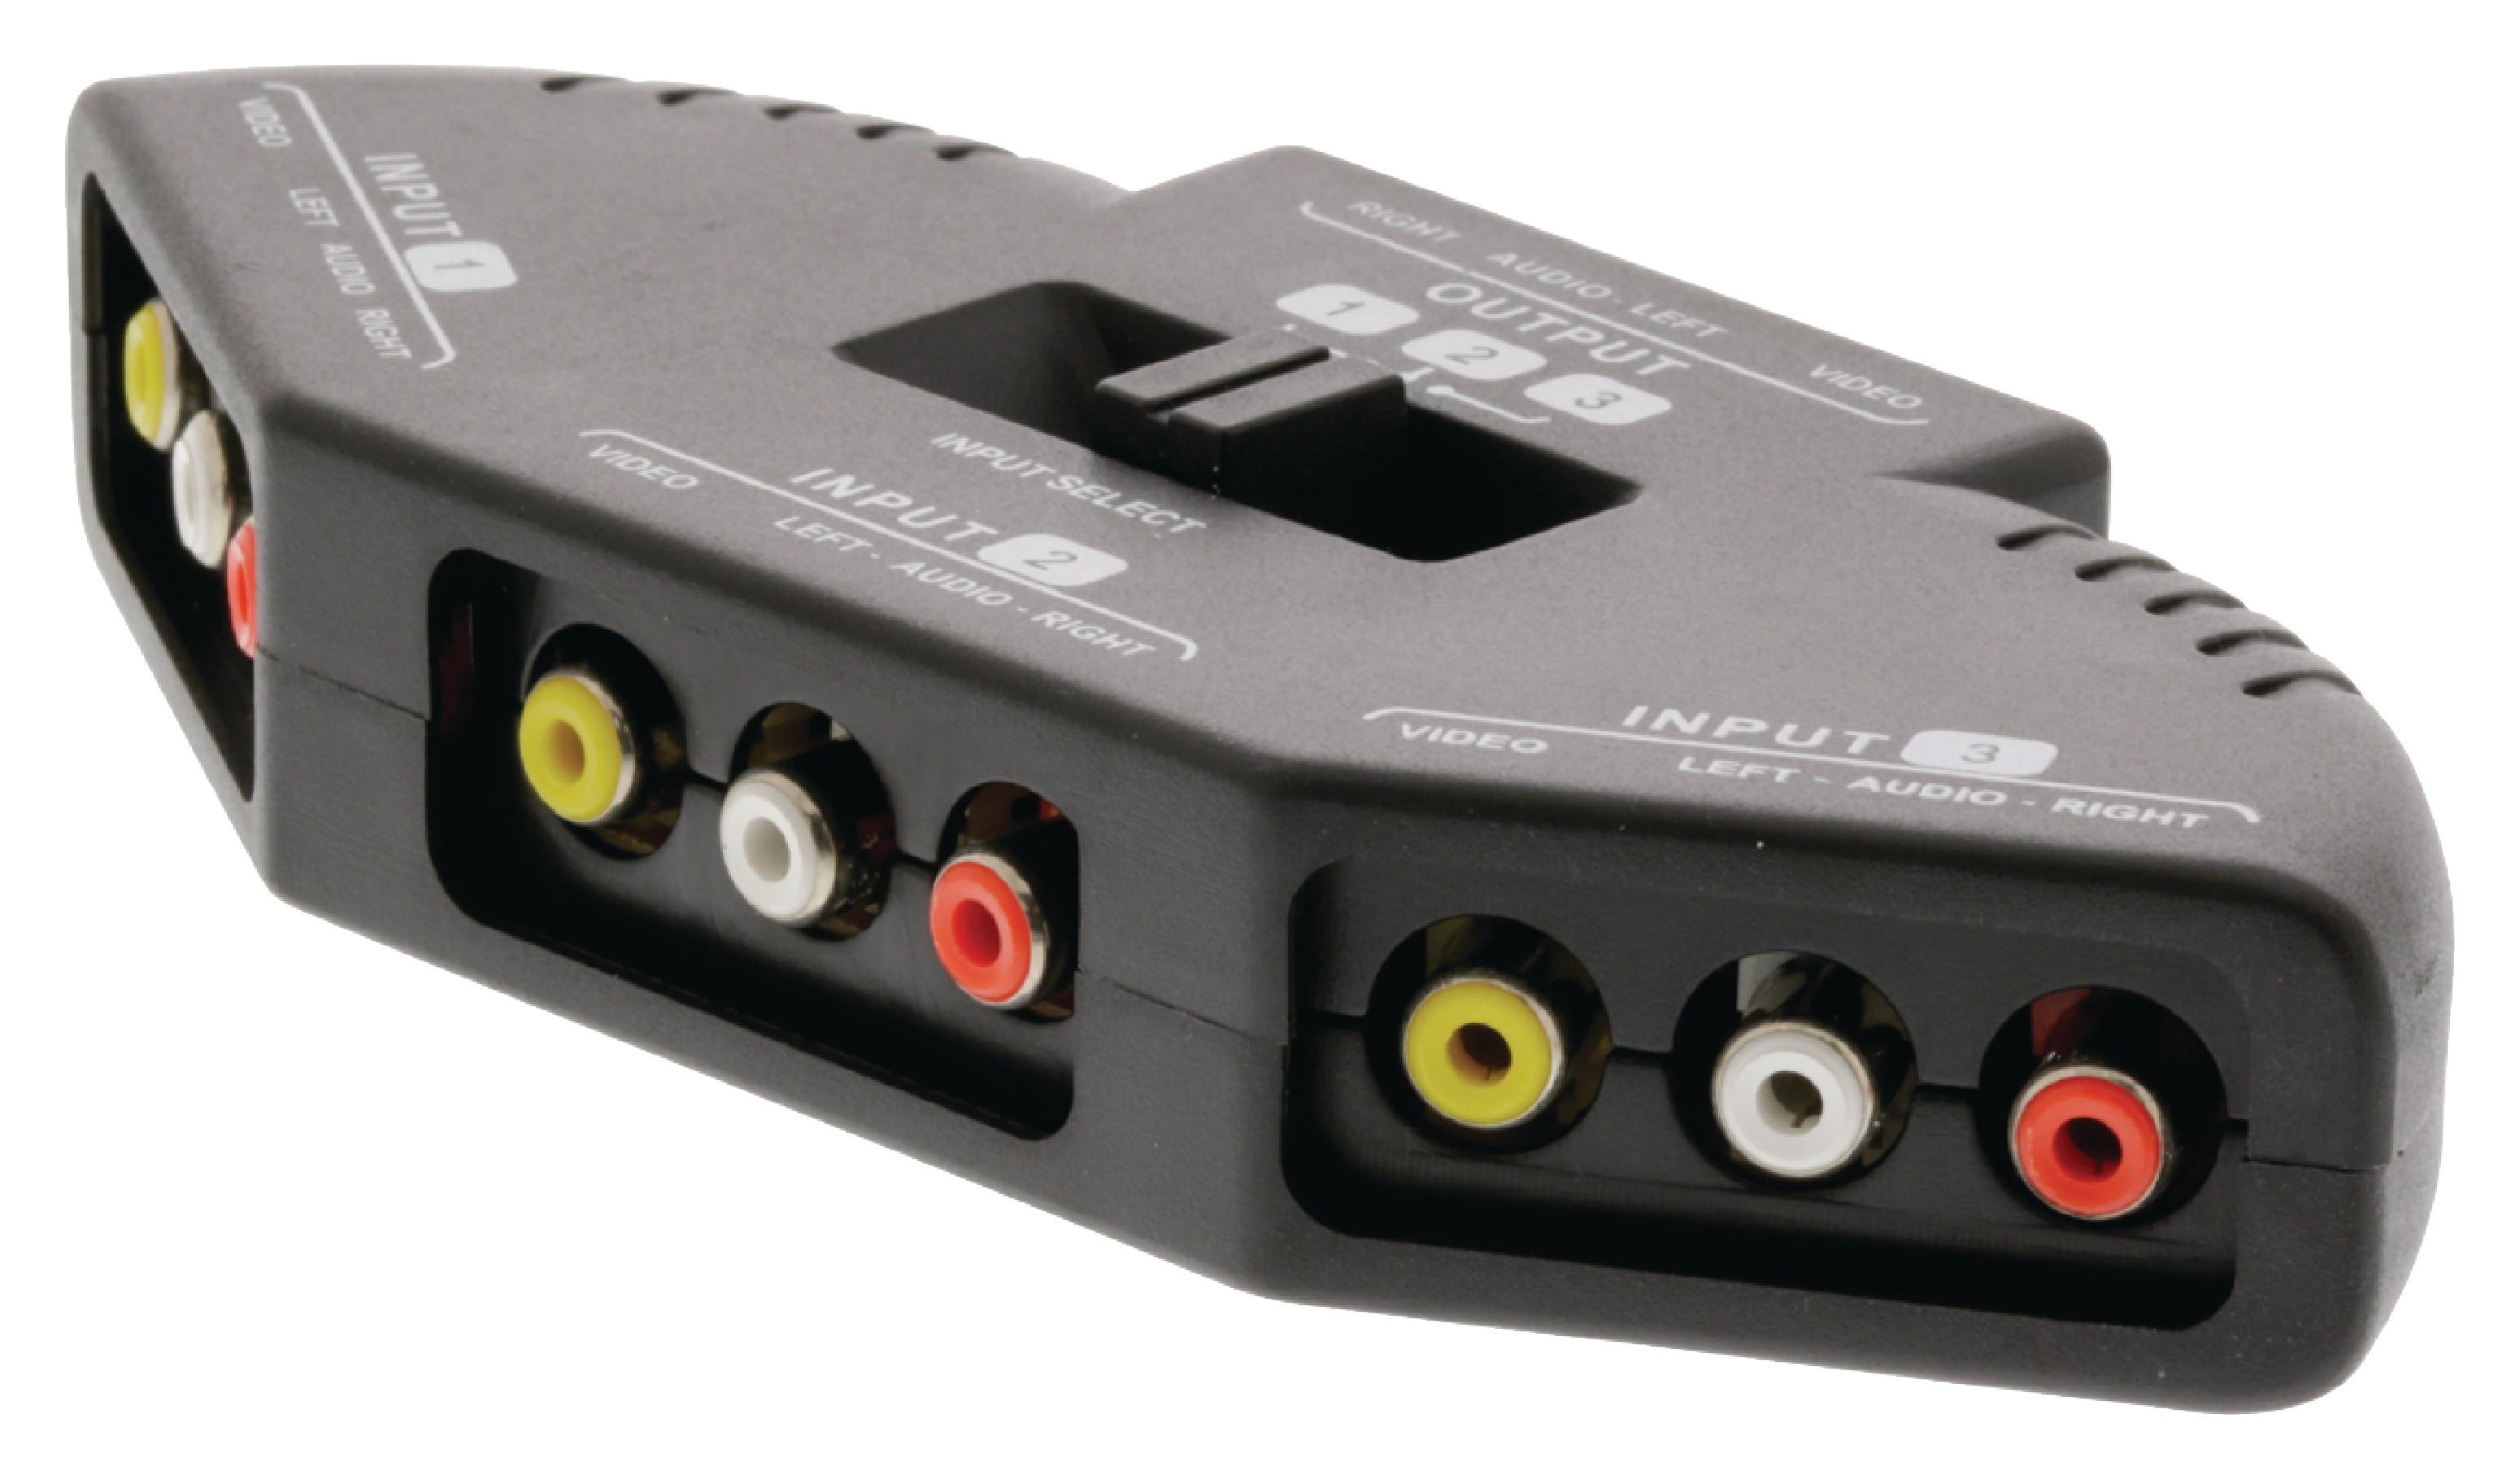 Valueline přepínač 3x AV vstup - 1x AV výstup VLVSW2403